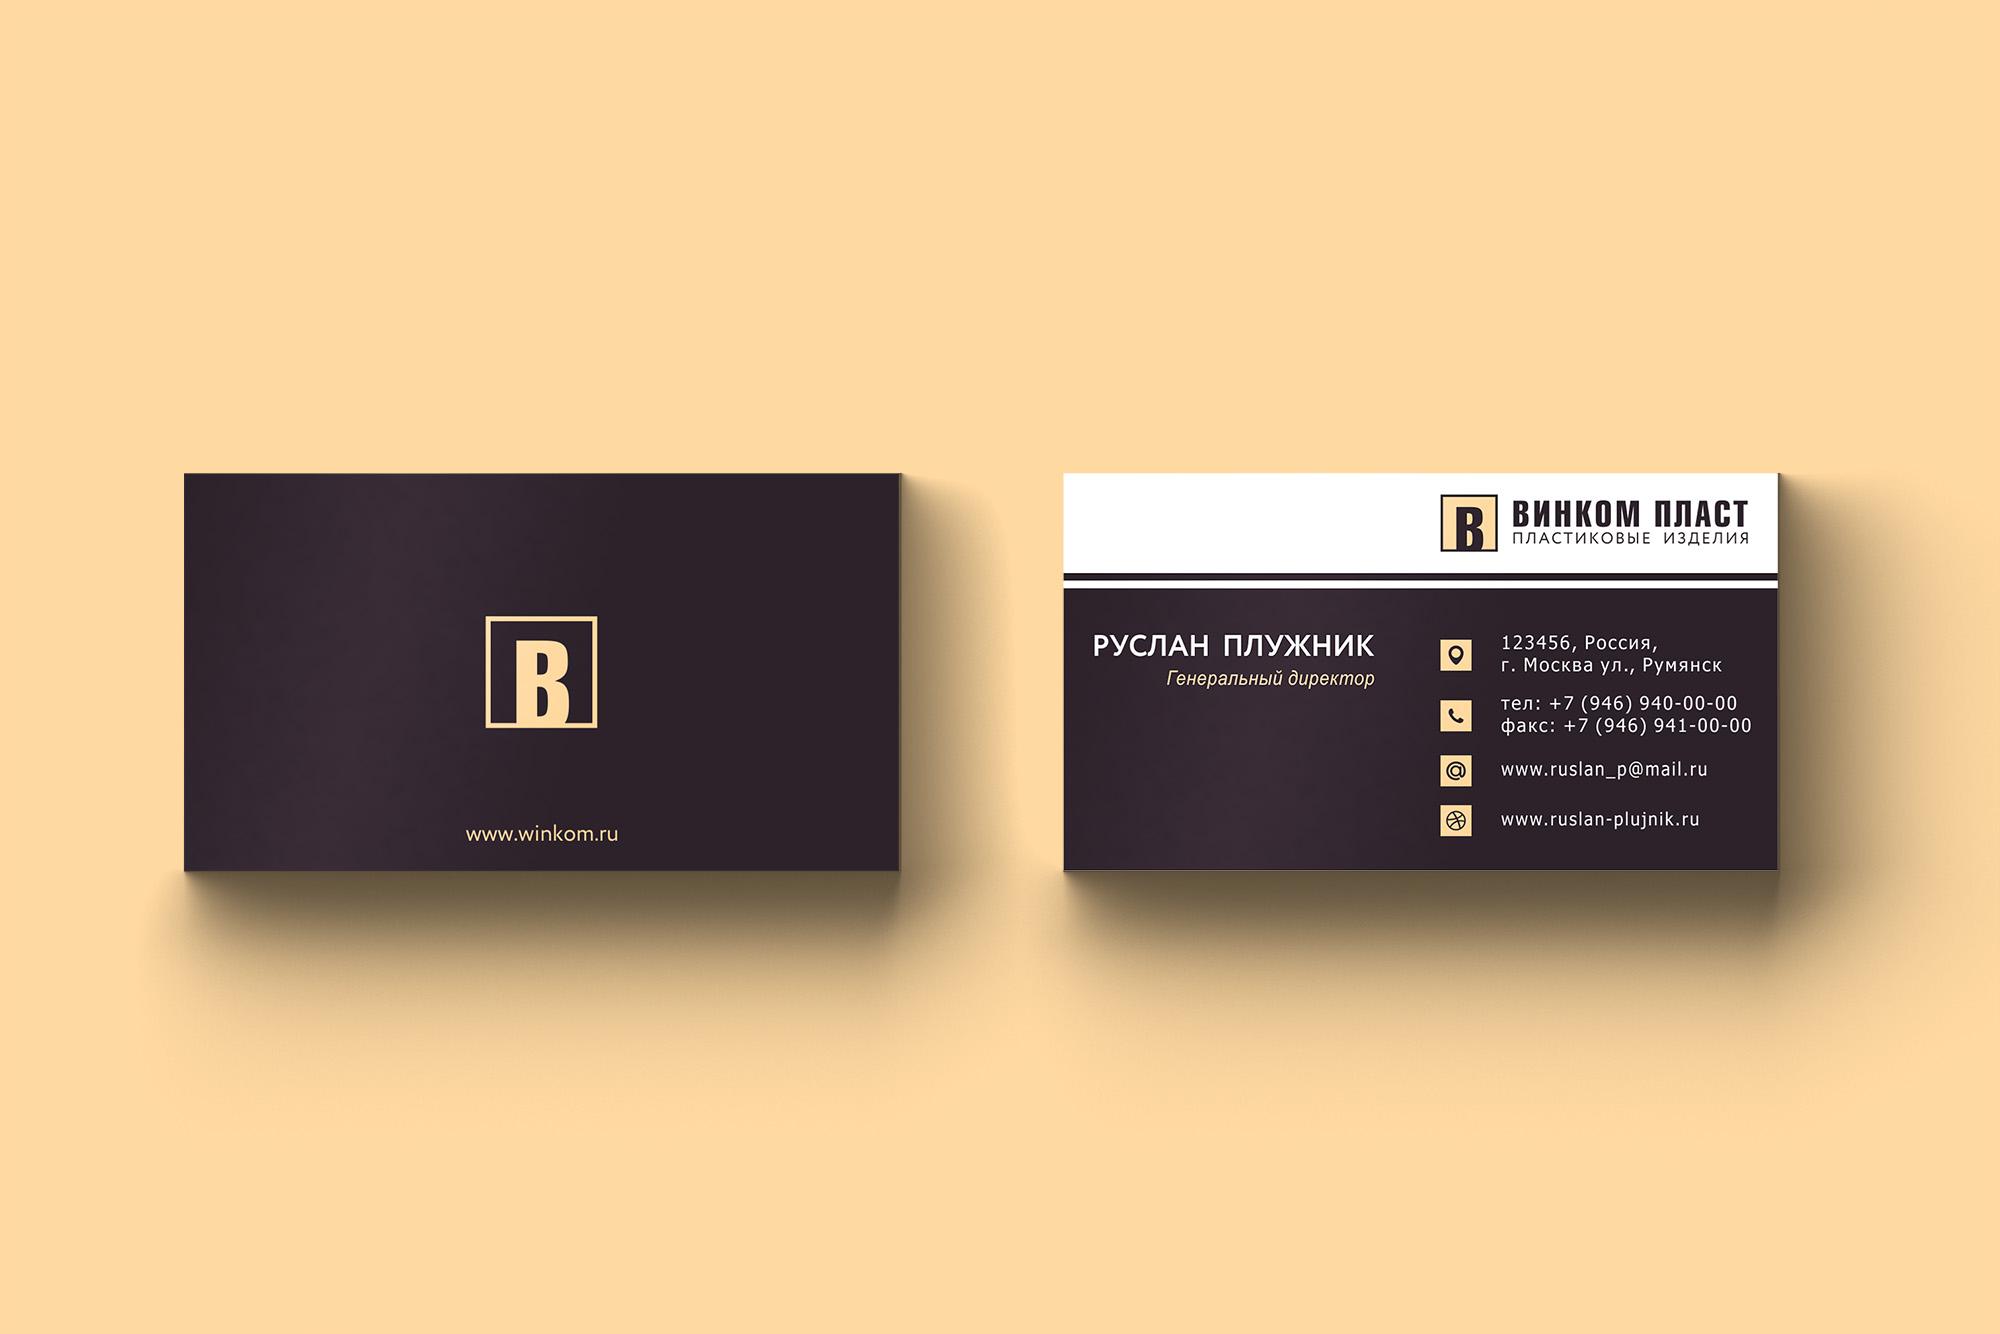 Логотип, фавикон и визитка для компании Винком Пласт  фото f_7435c3c5b13e467e.jpg